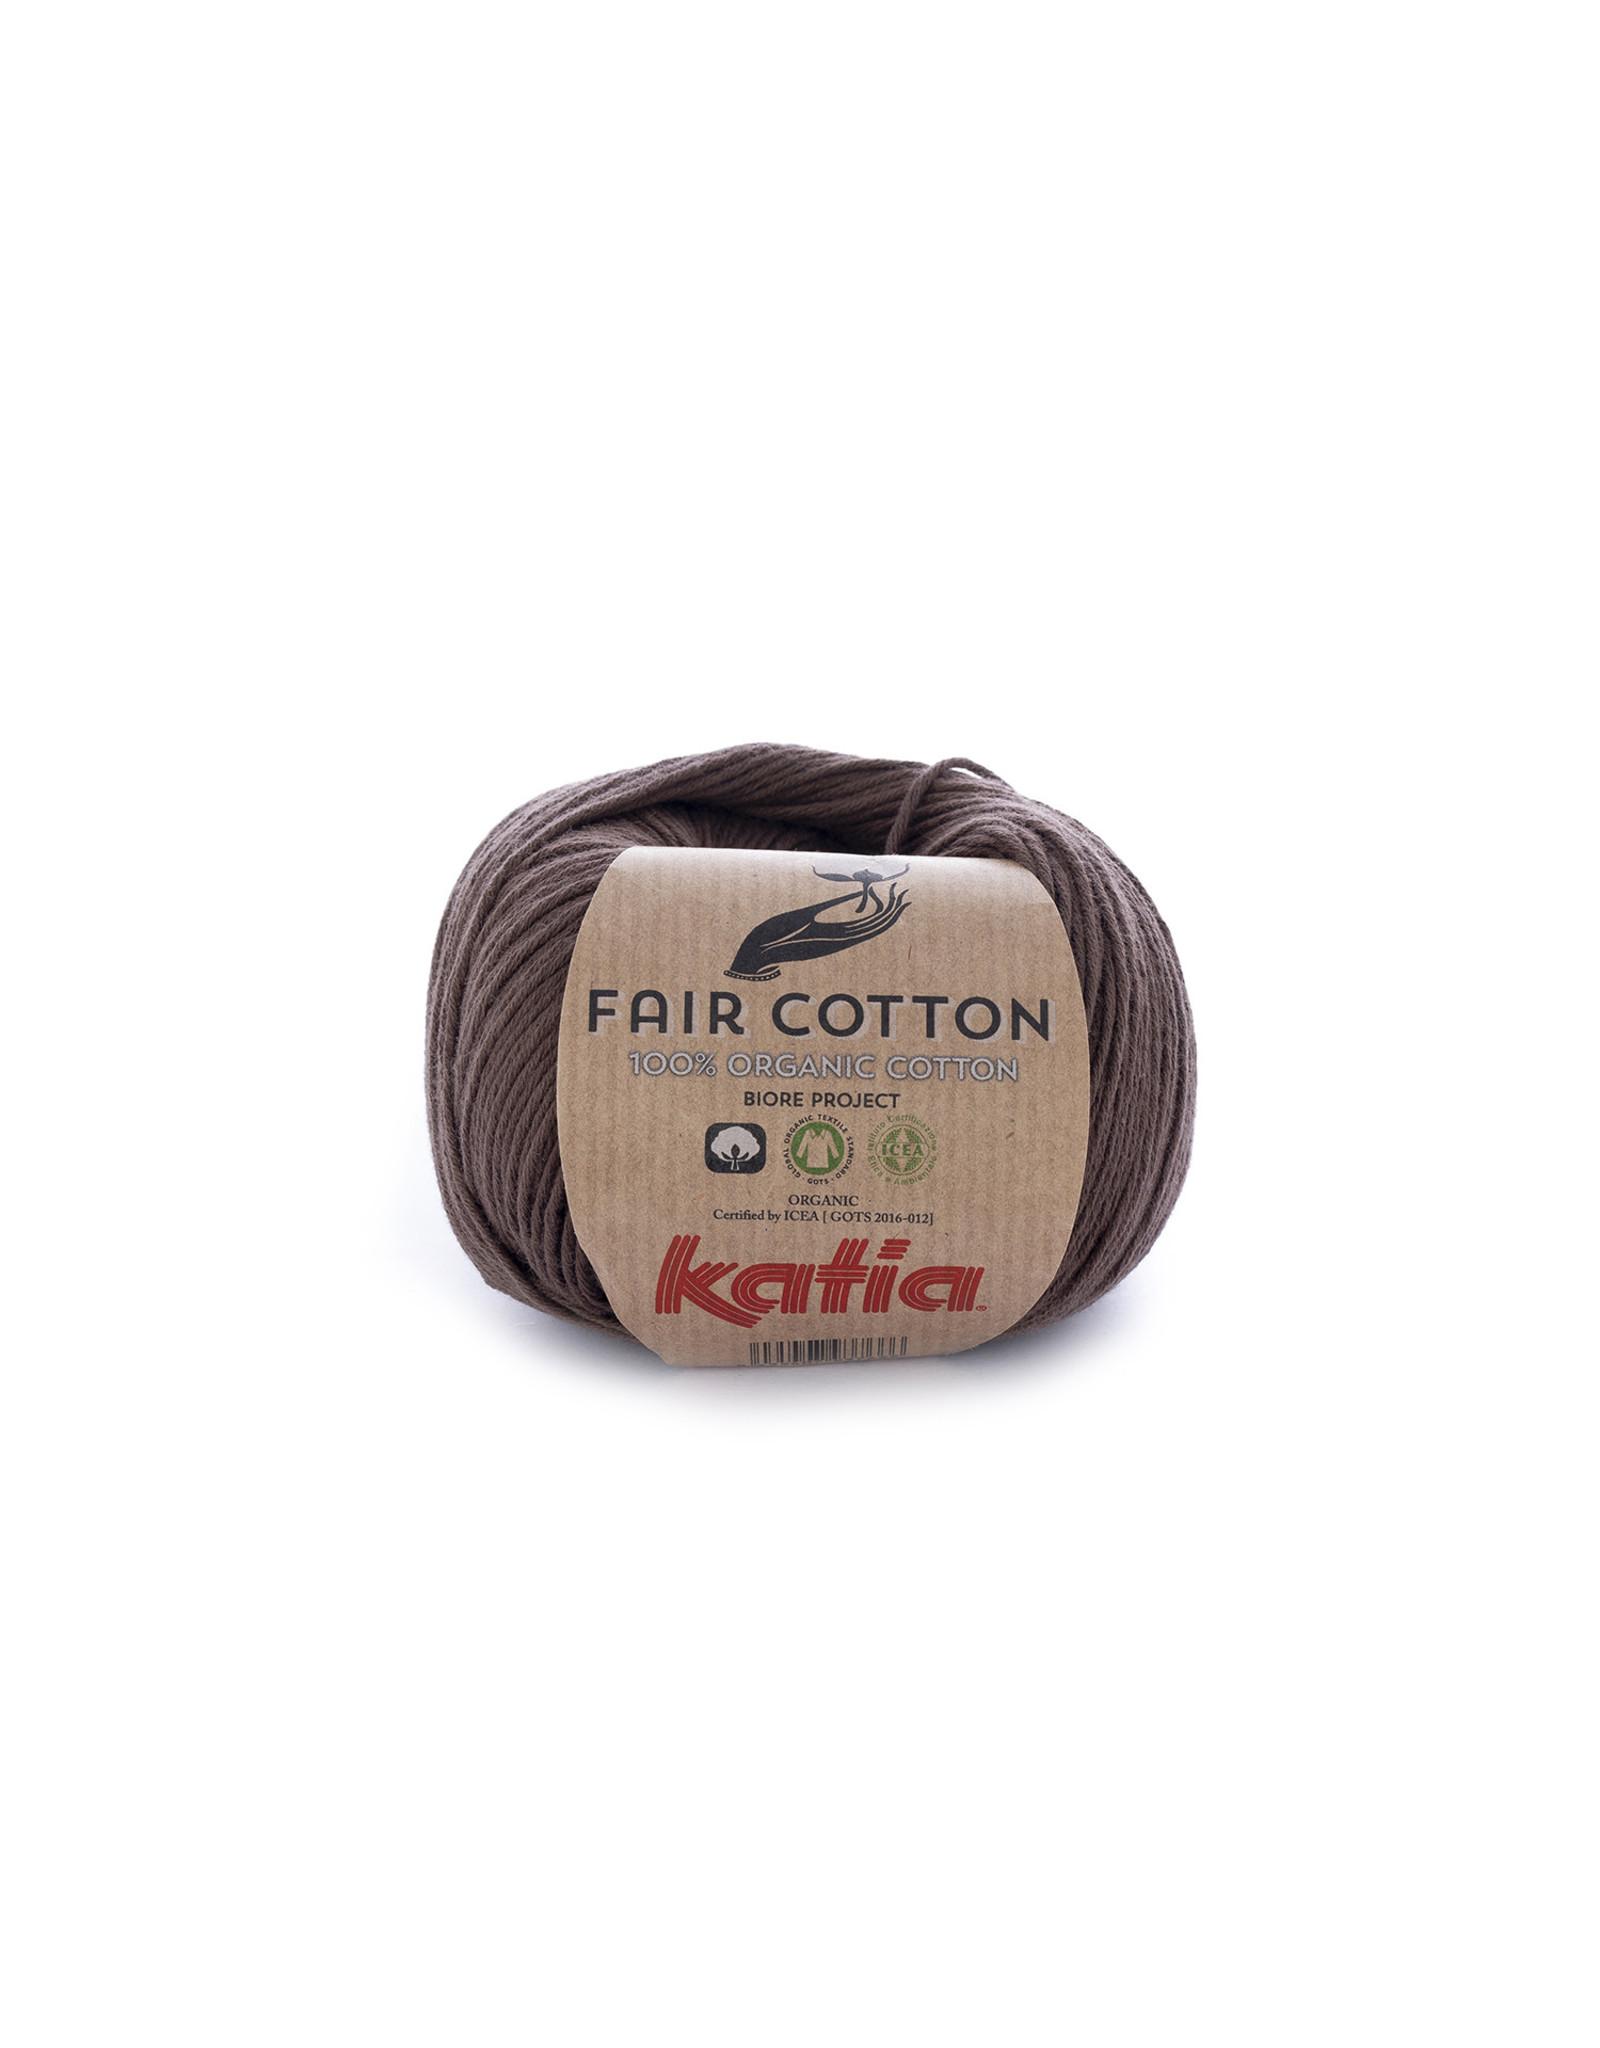 Katia Katia Fair Cotton  25 - bruin - - 50 gr. - 100% biol. katoen